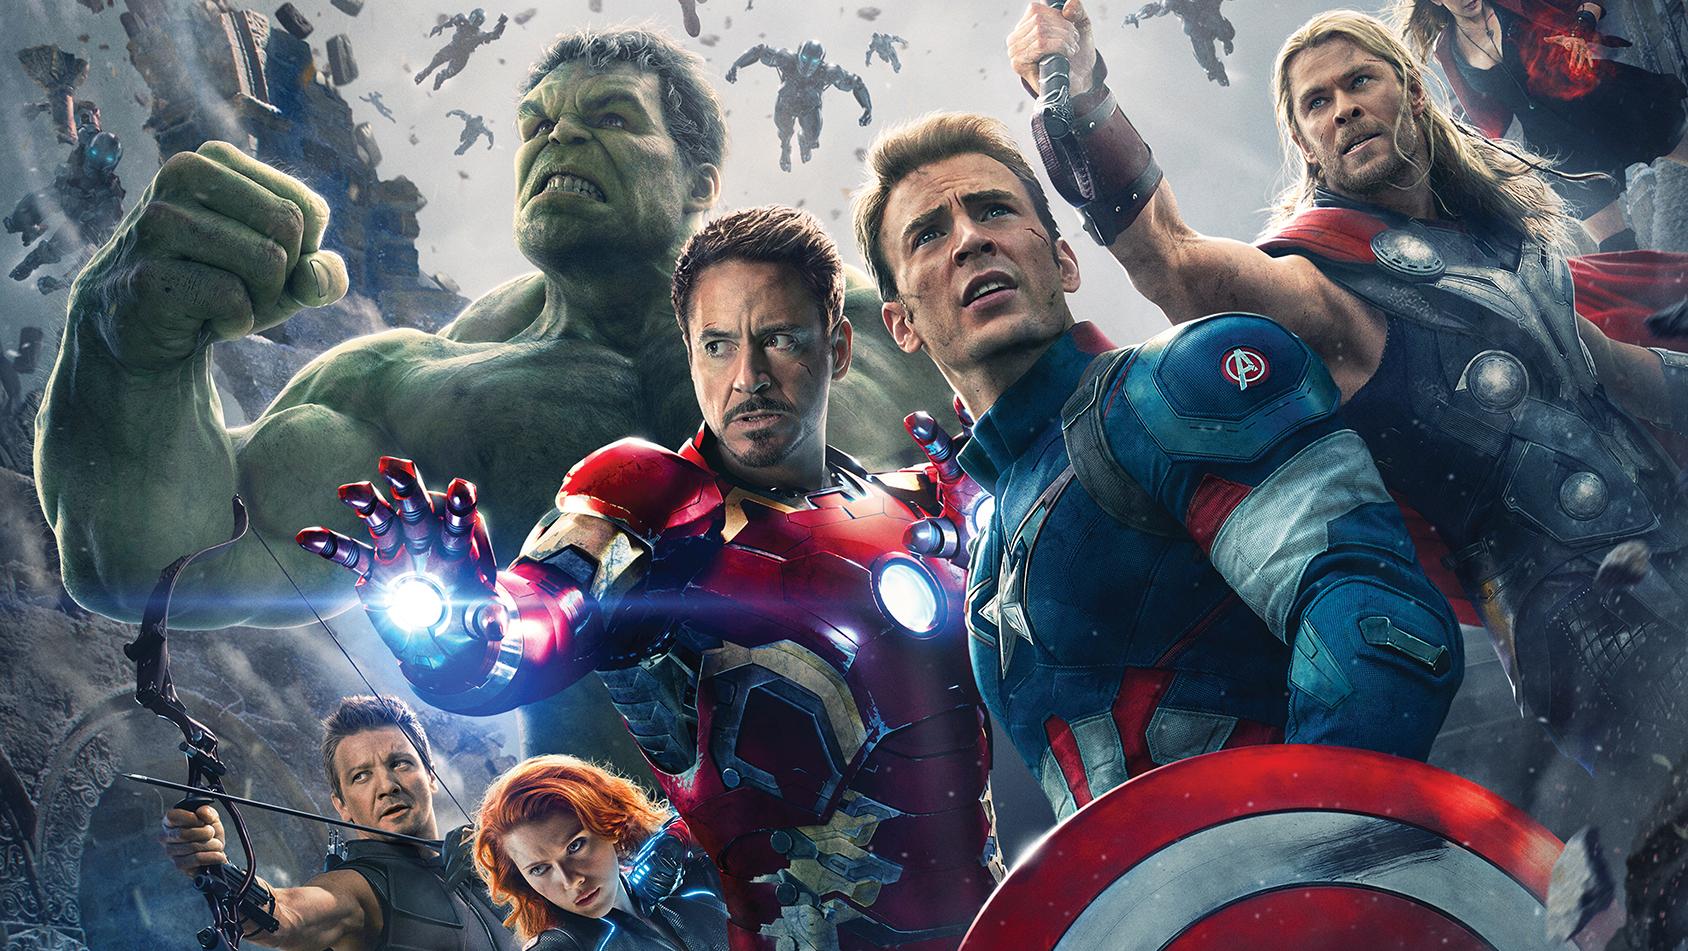 Avengers2PosterC